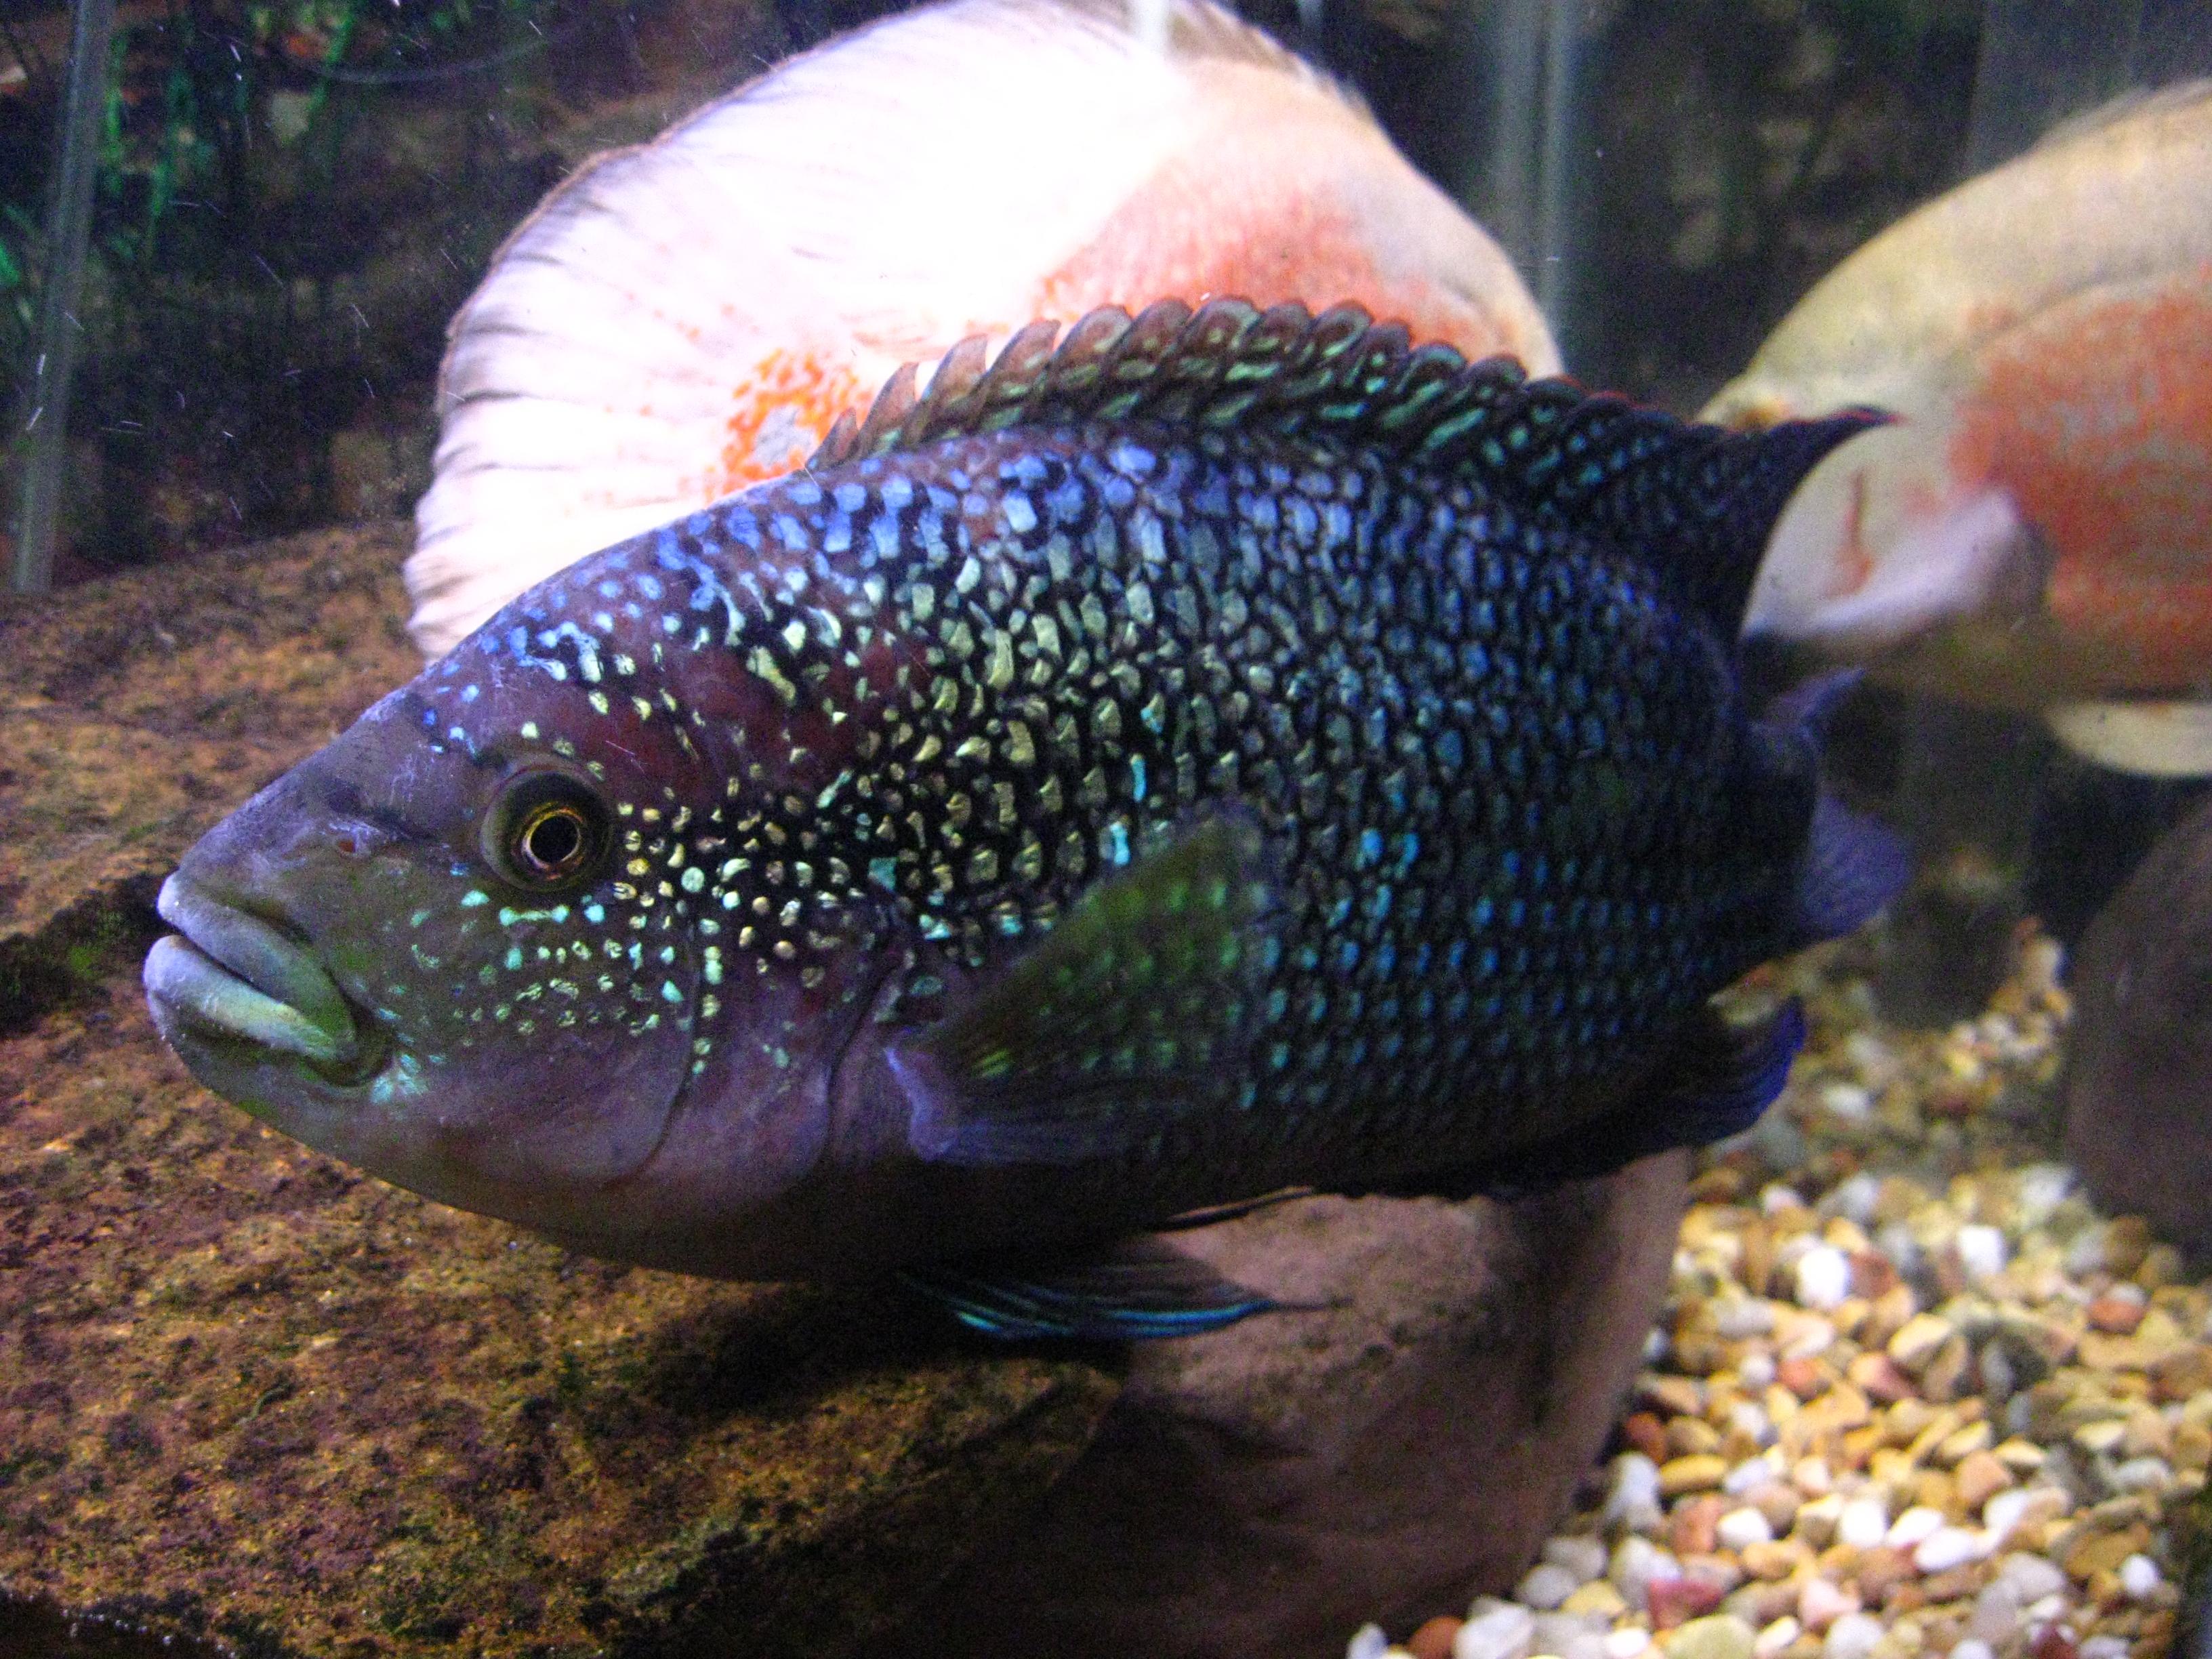 Jack dempsey cichlid for Jack dempsy fish